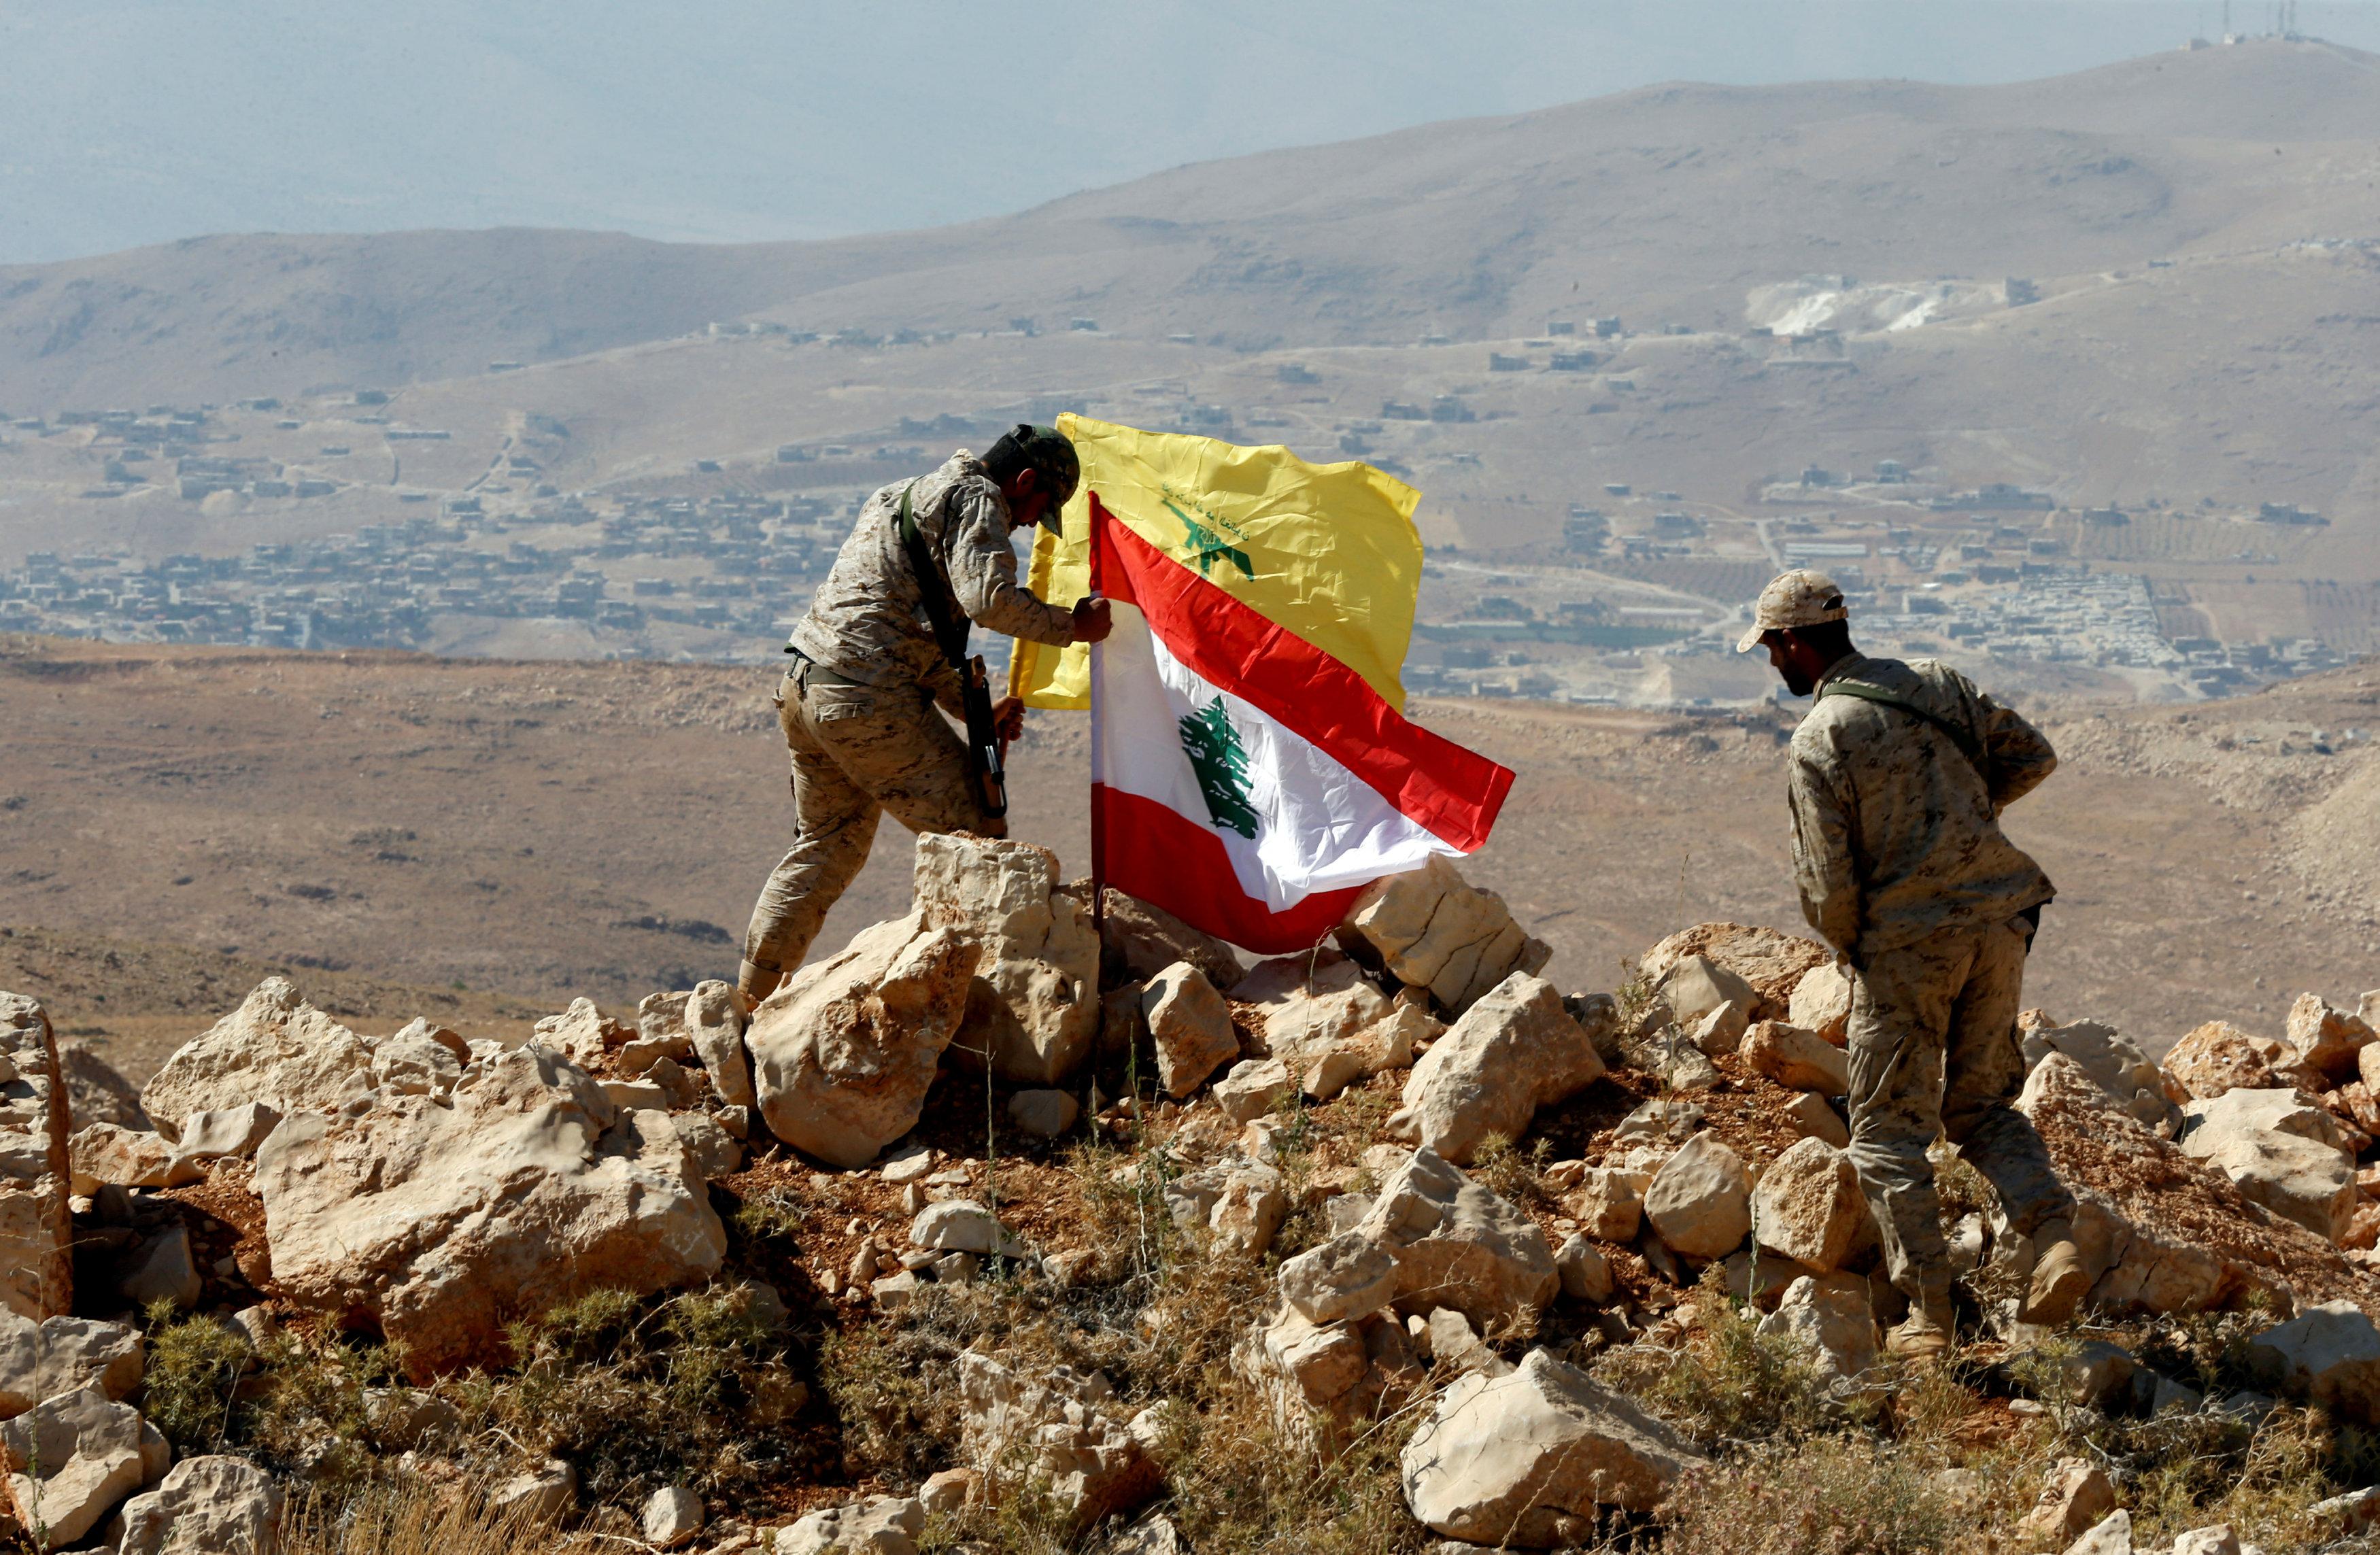 Hezbollah emerges a winner from Mideast turmoil, alarming foes